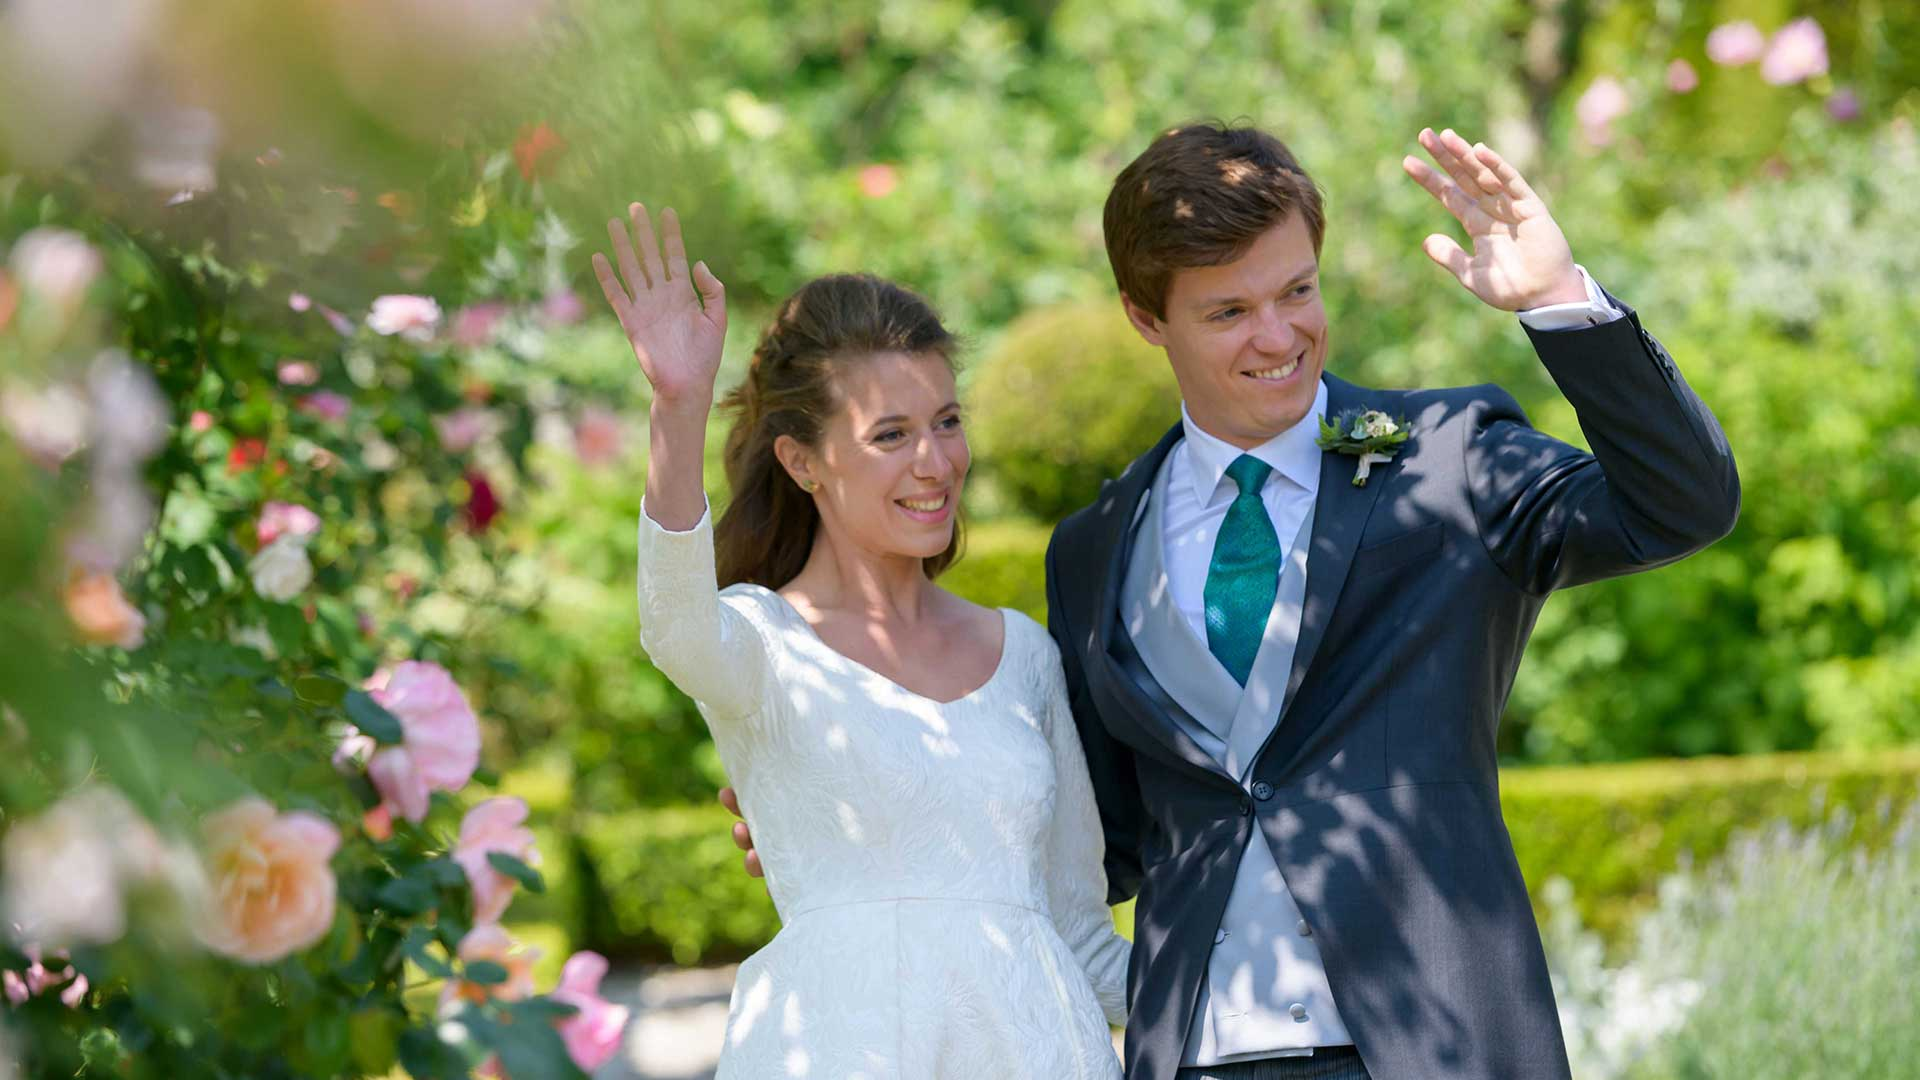 photographe-mariage-ile-de-france-05